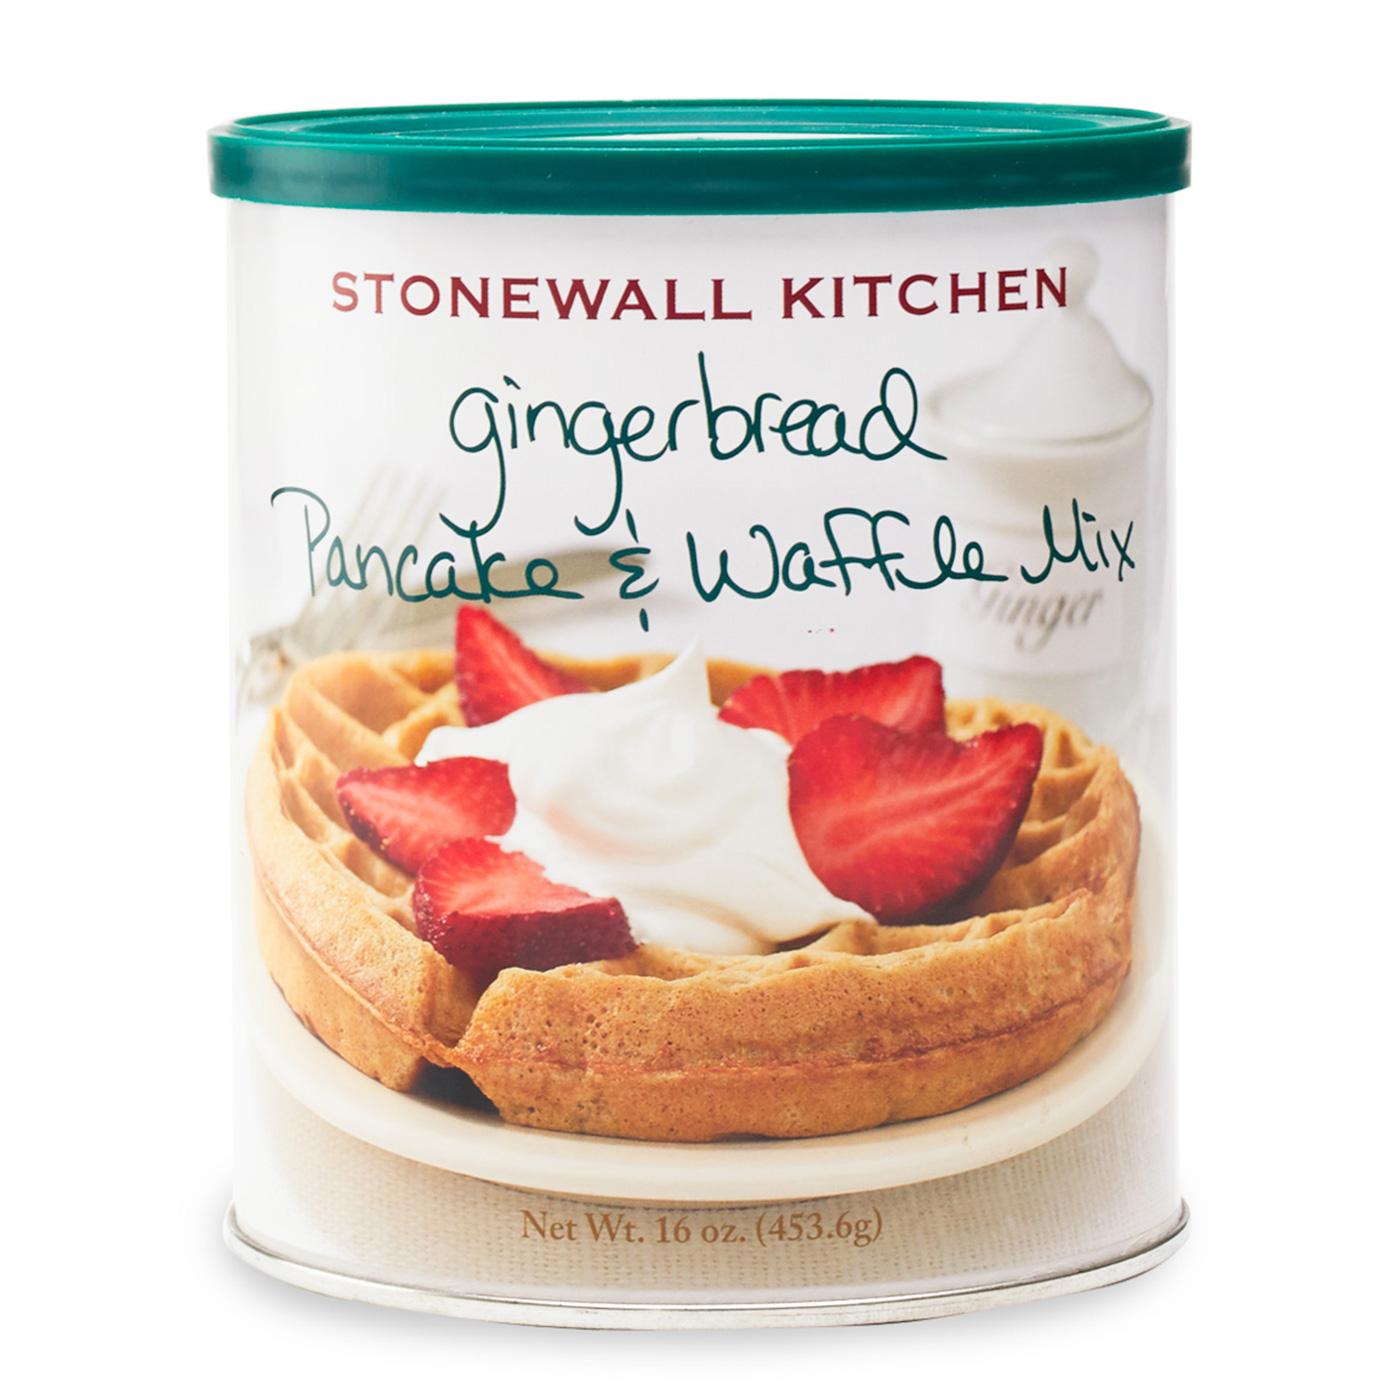 gingerbread pancake waffle mix pancakes syrups stonewall kitchen rh stonewallkitchen com stonewall kitchen pancake mix review stonewall kitchen pancake mix uk